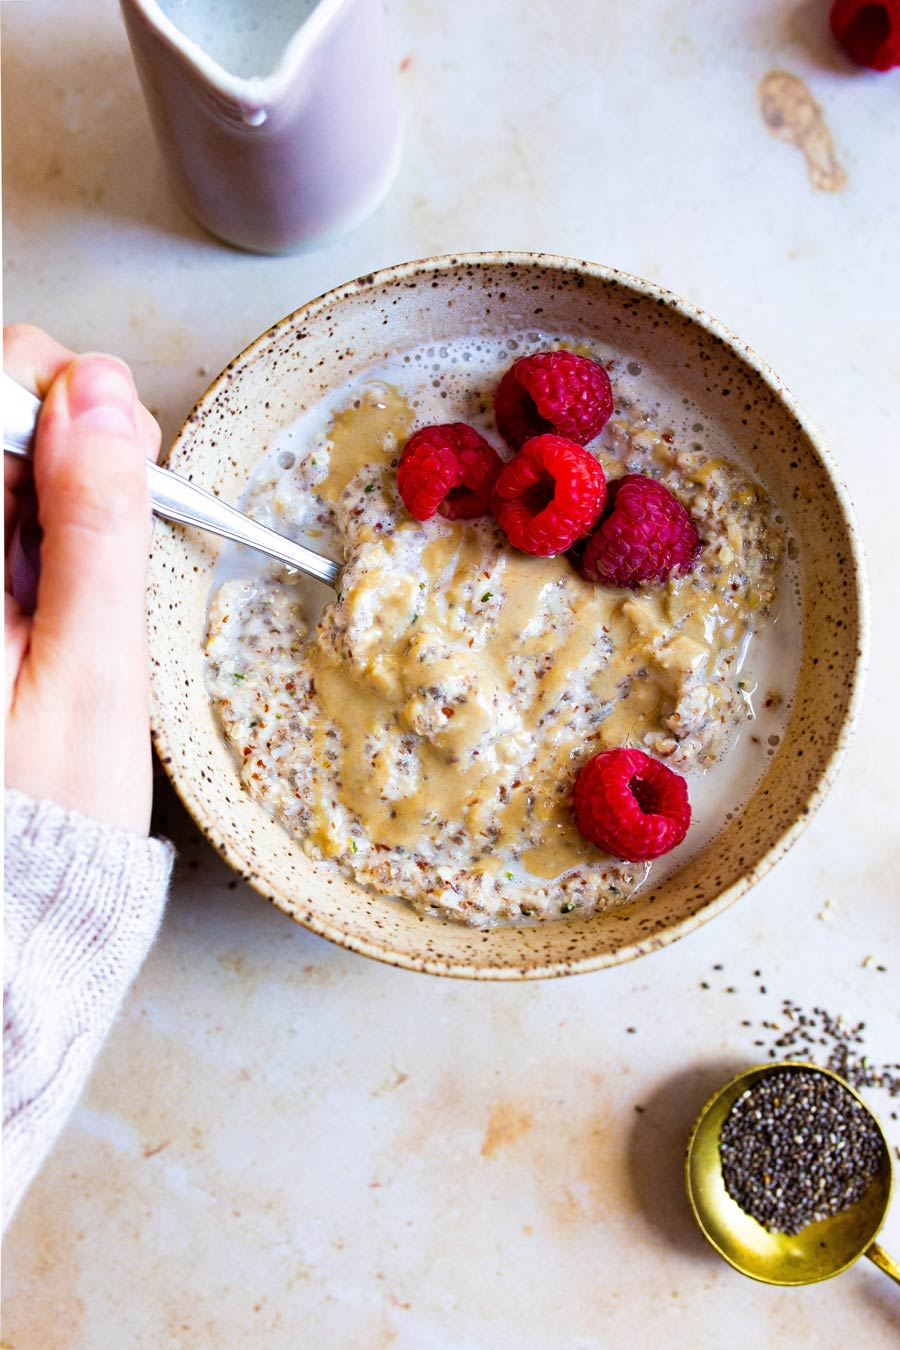 Easy Grain-free Porridge (Paleo, Whole30, Gluten-free, Vegan) via Food by Mars